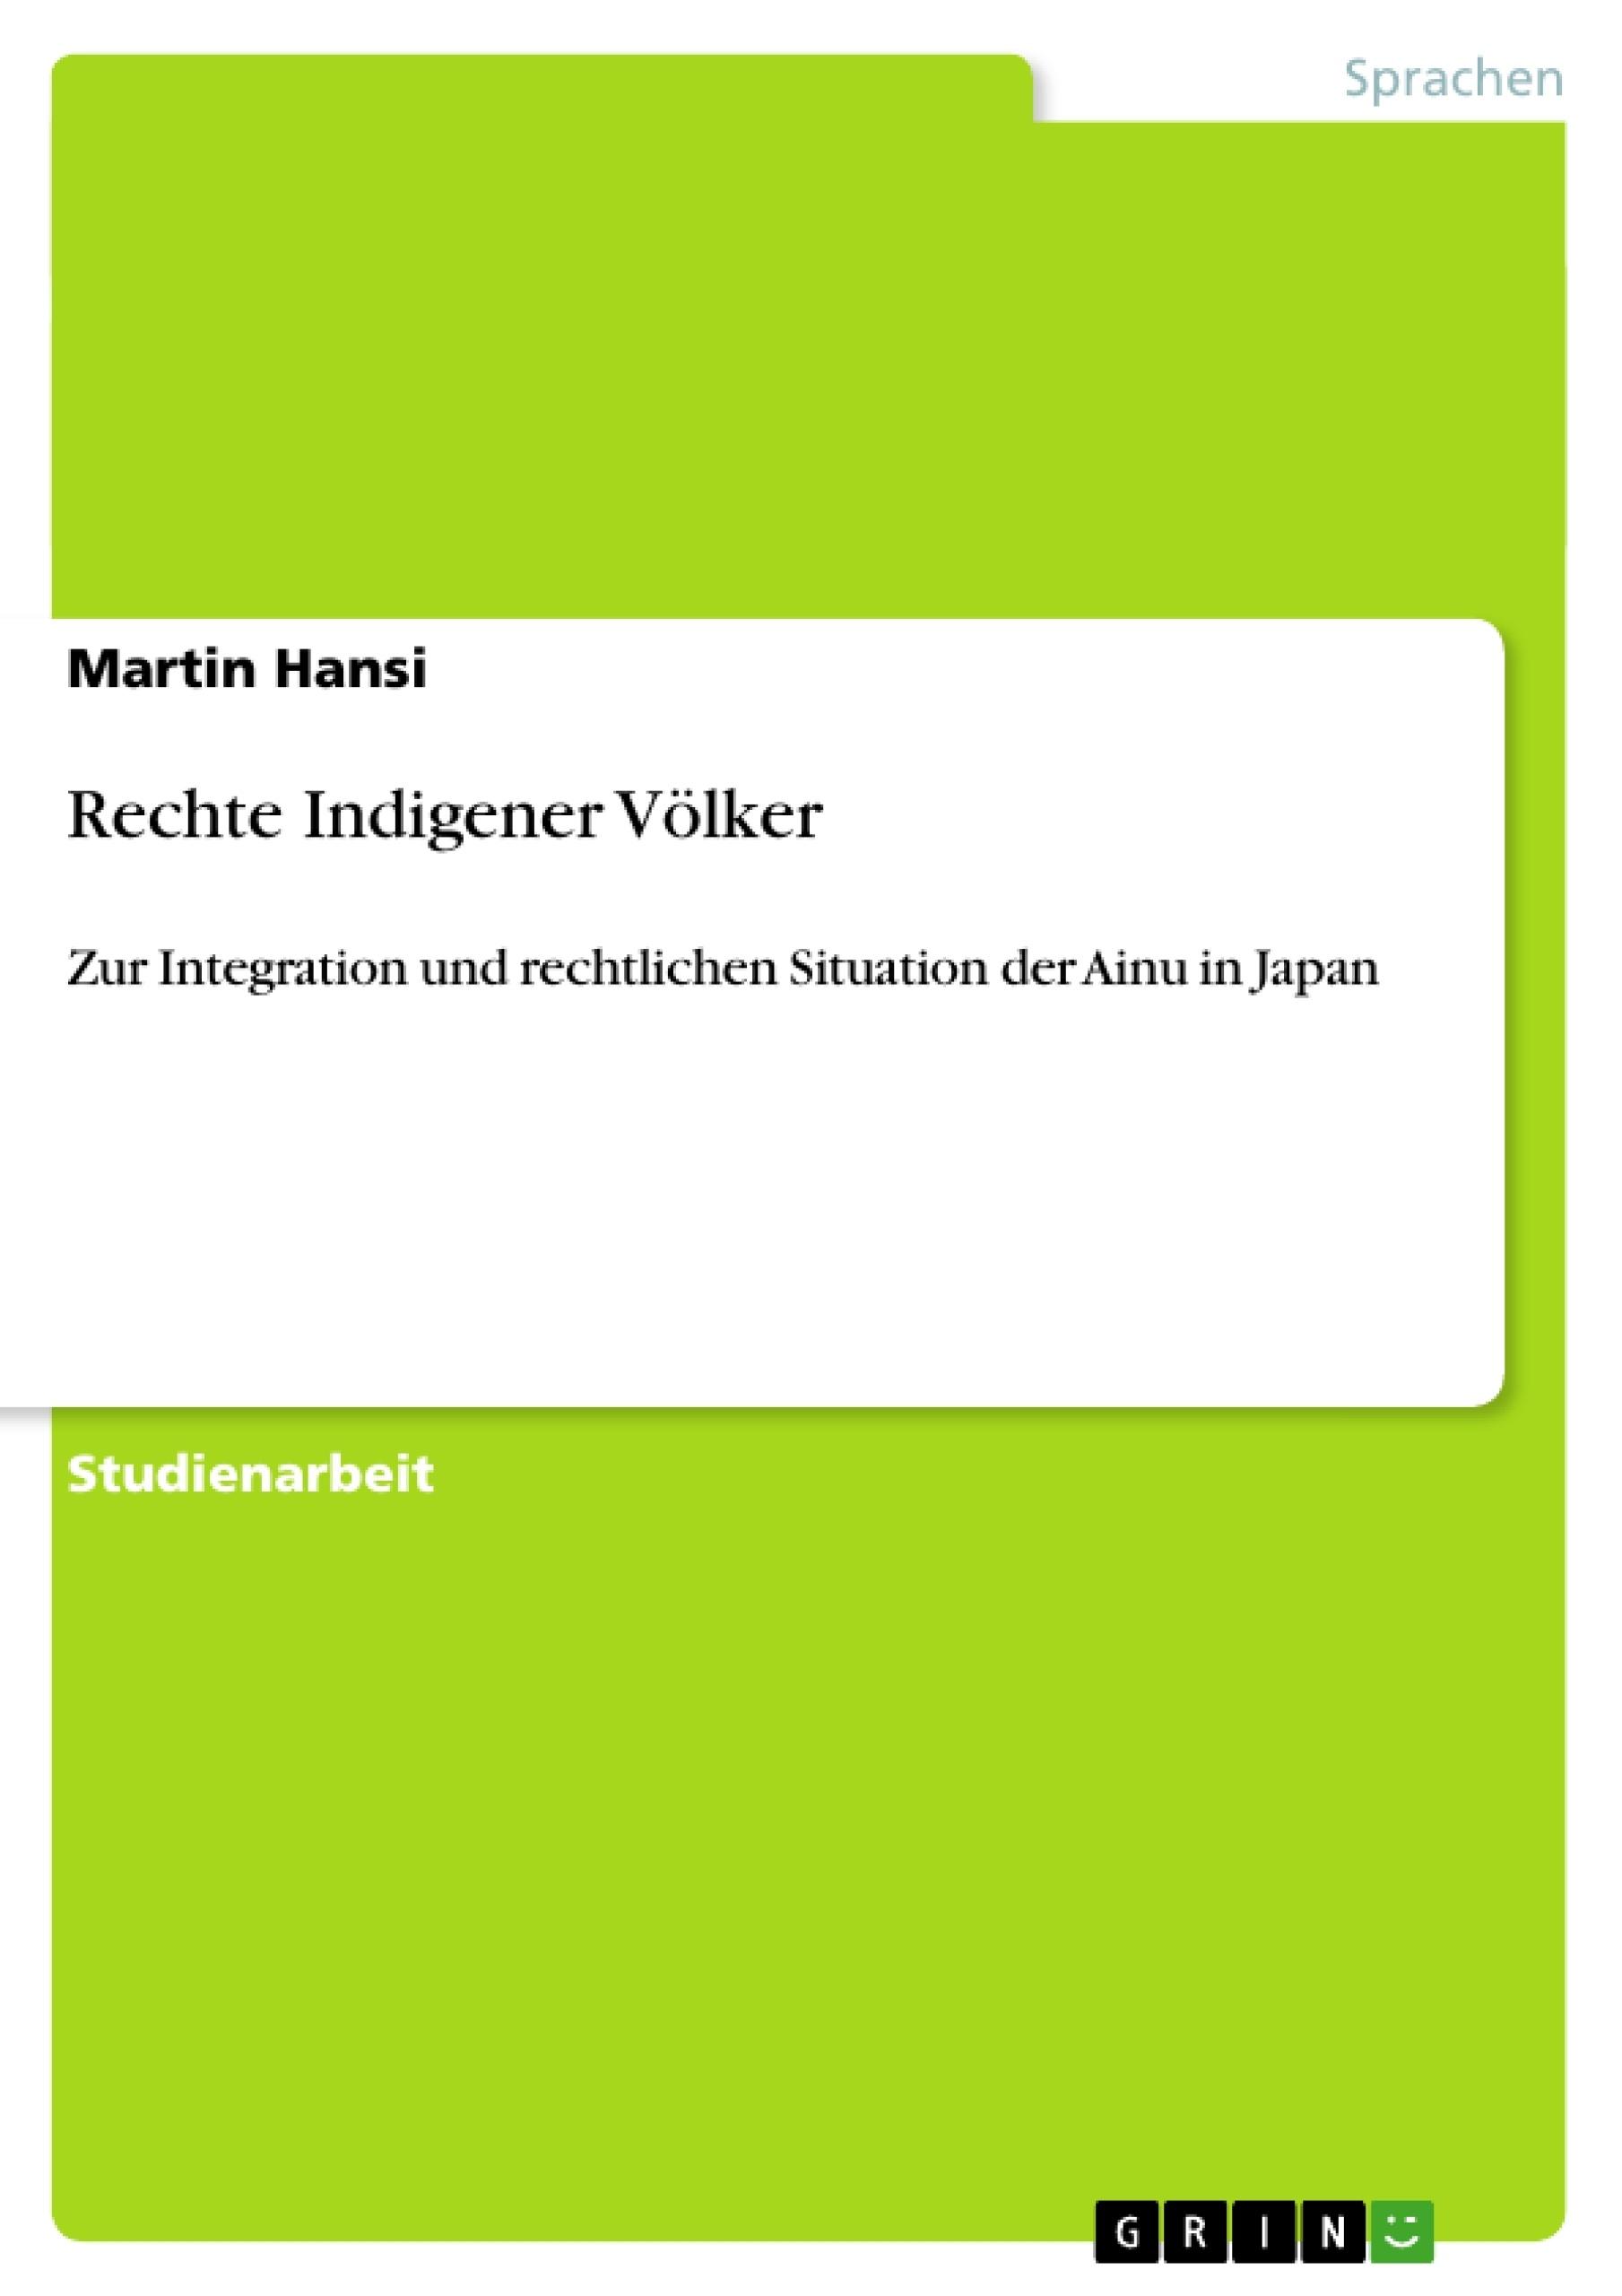 Titel: Rechte Indigener Völker